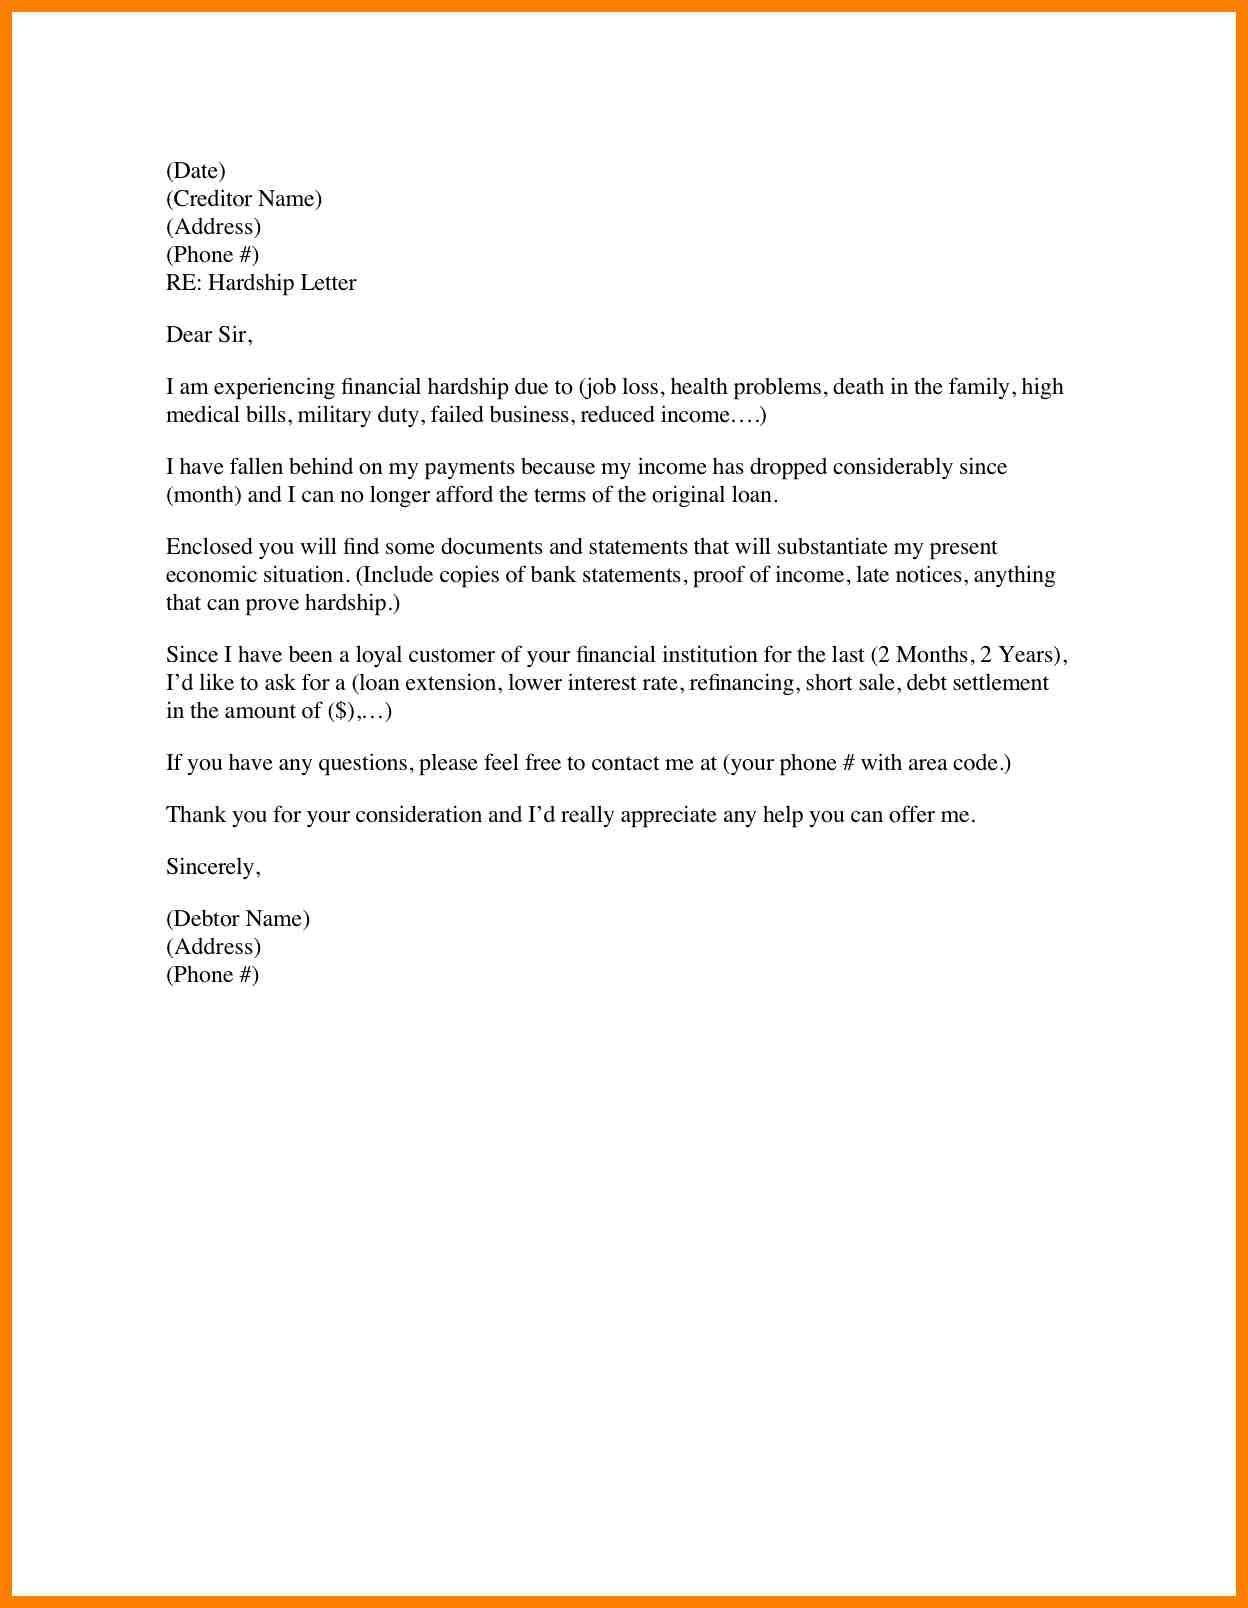 Financial Hardship Letter Template - Hardship Letter for Job Transfer Fresh Financial Hardship Letter for